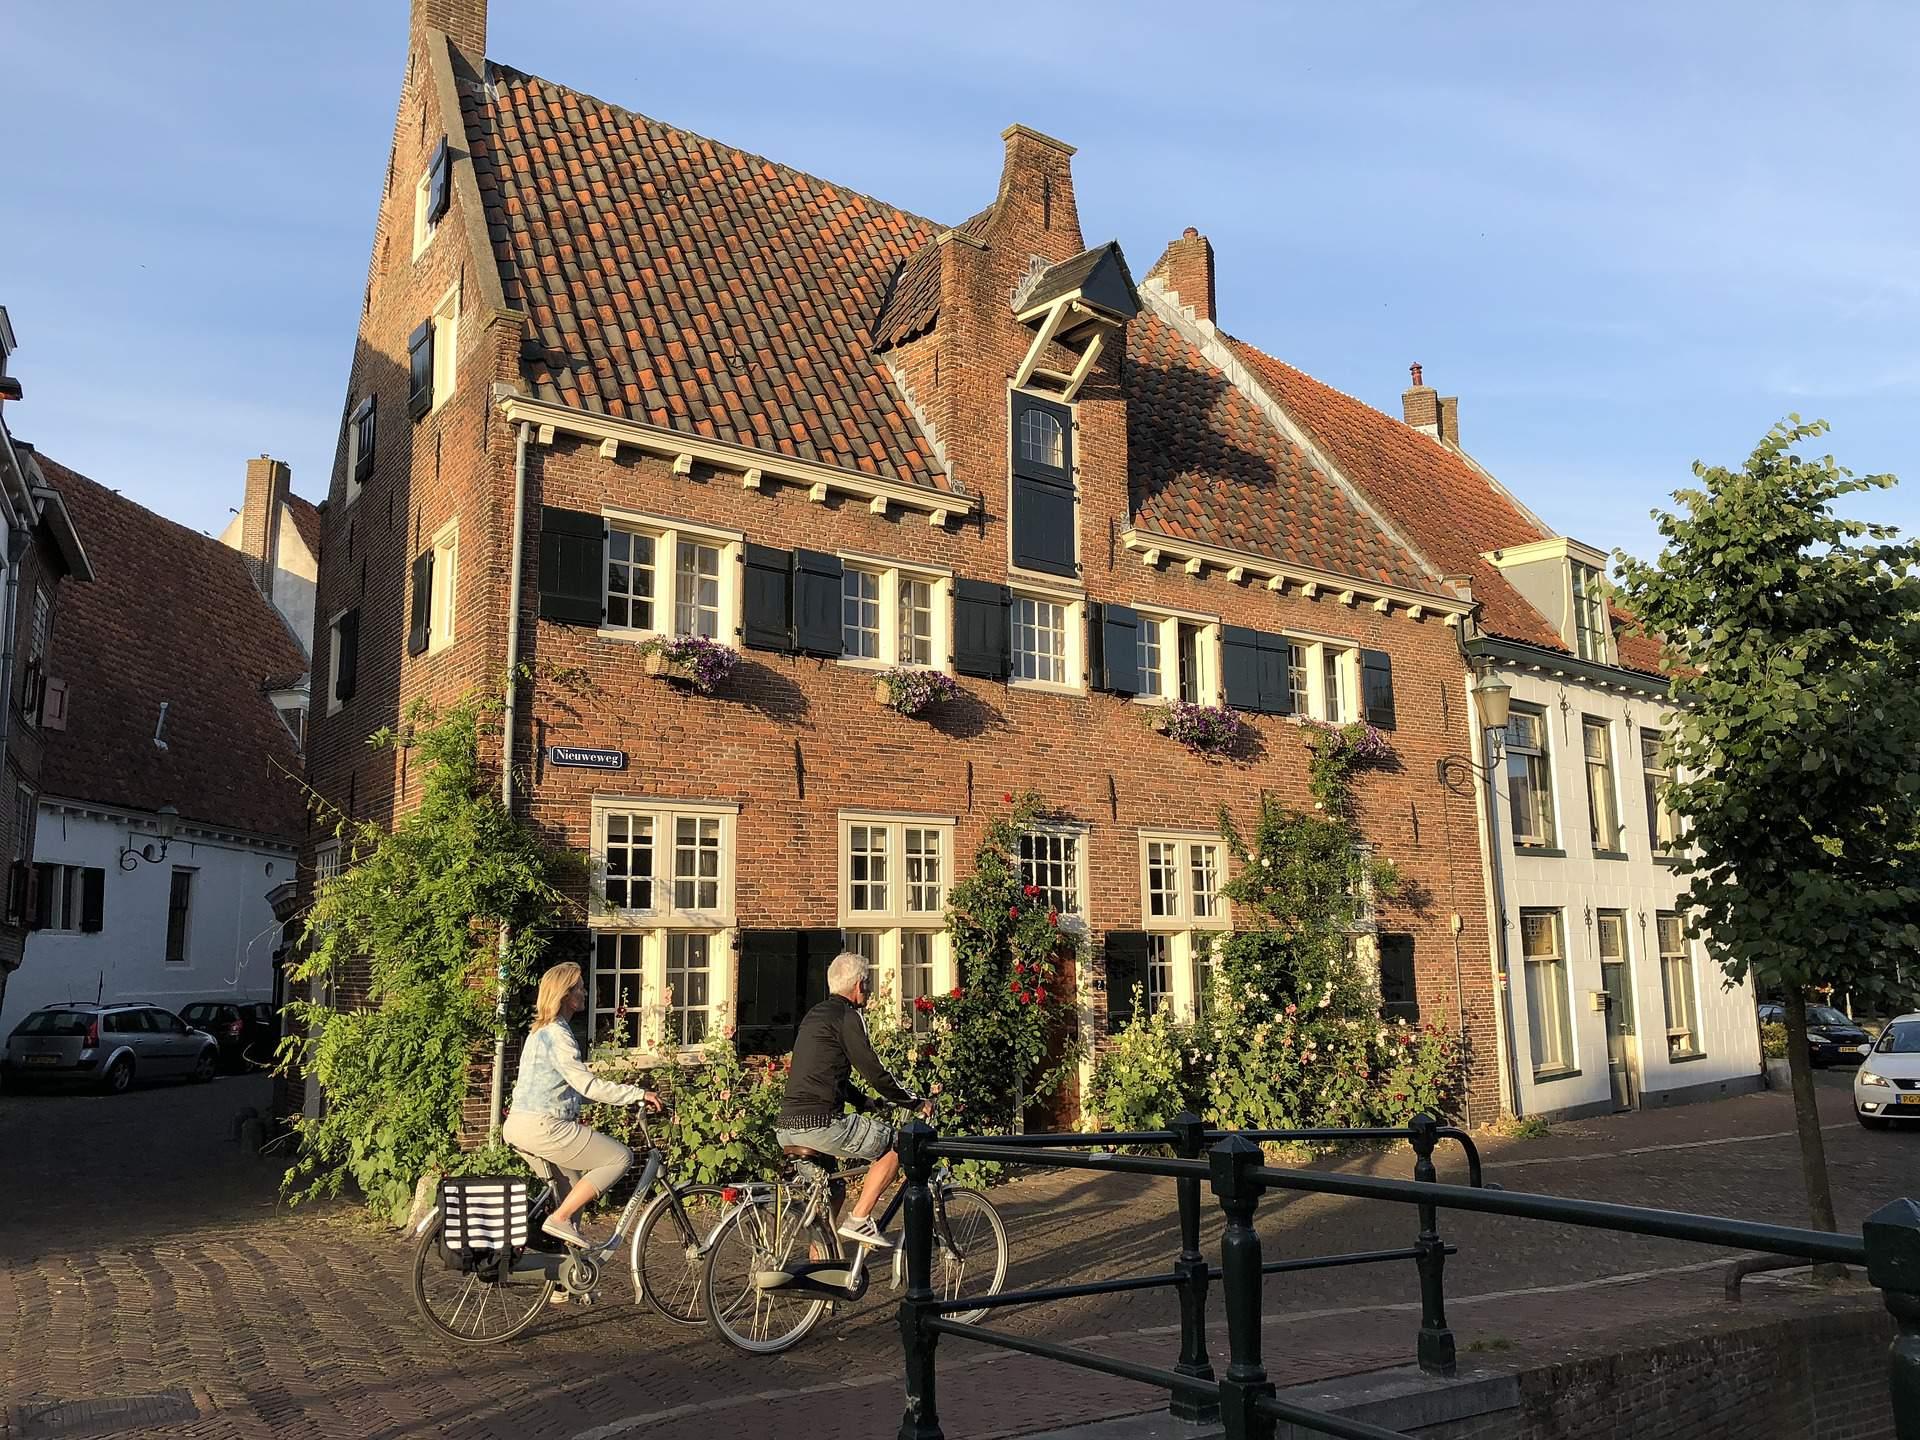 Busreis fietsvakantie vierprovinciënroute Amersfoort